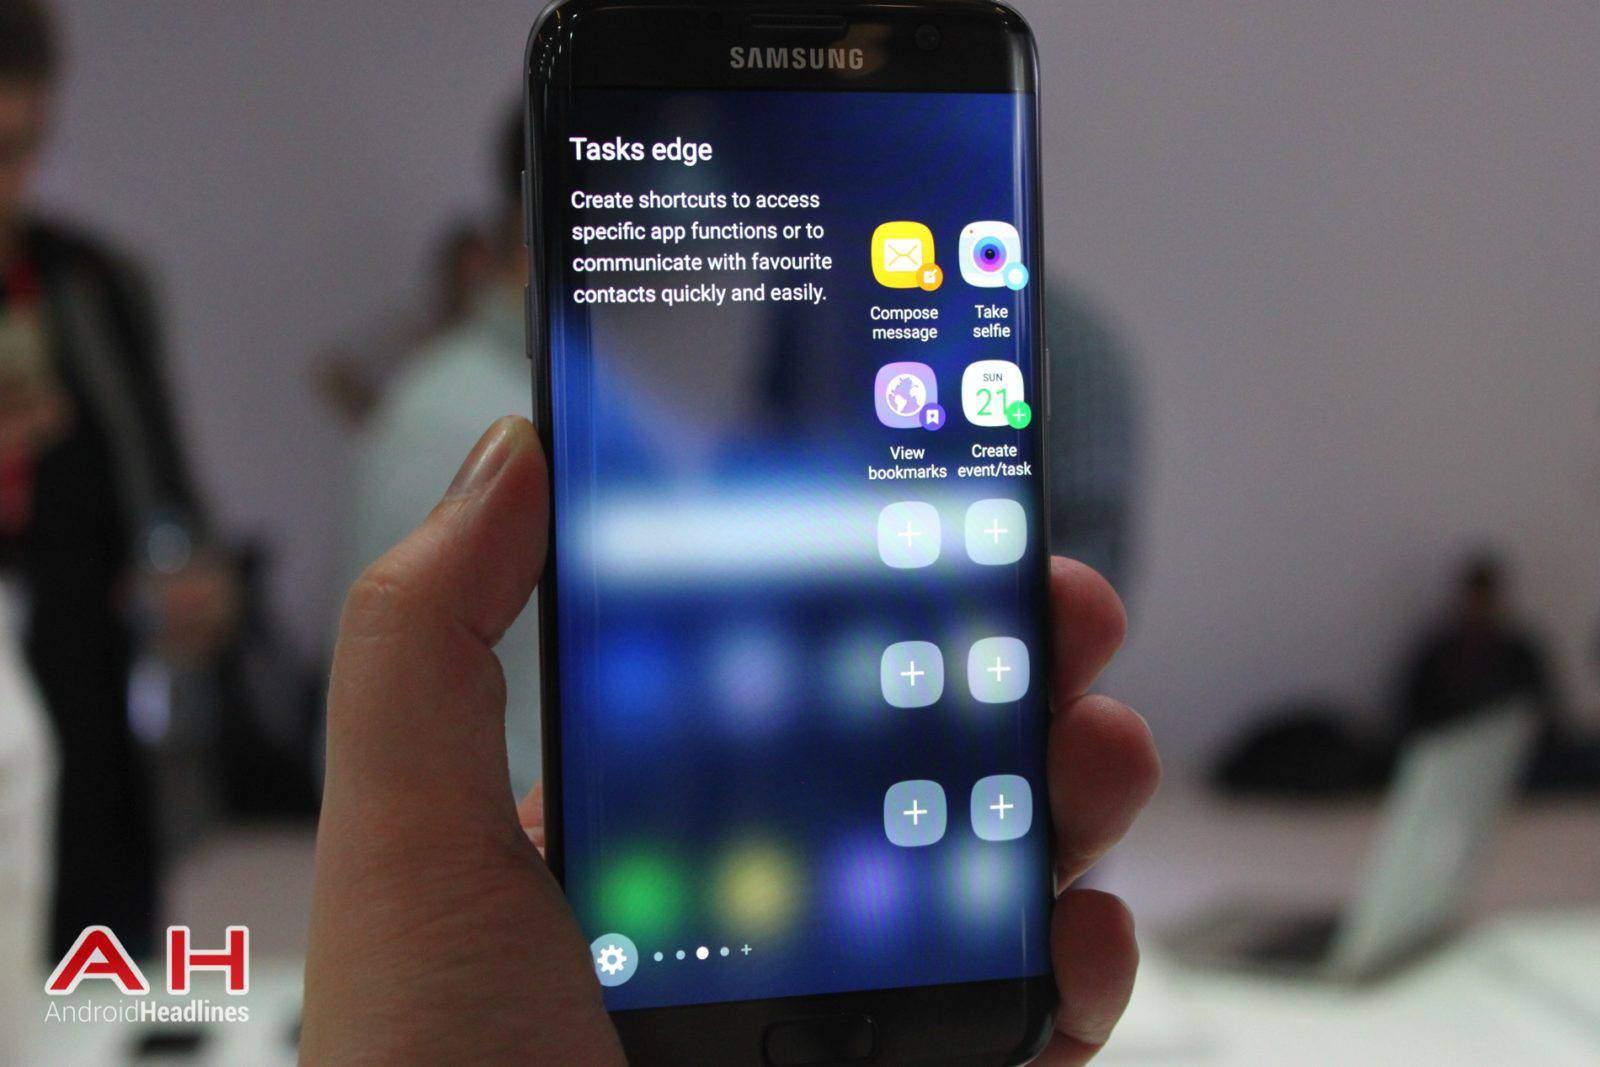 Galaxy S7 Edge MWC AH 21